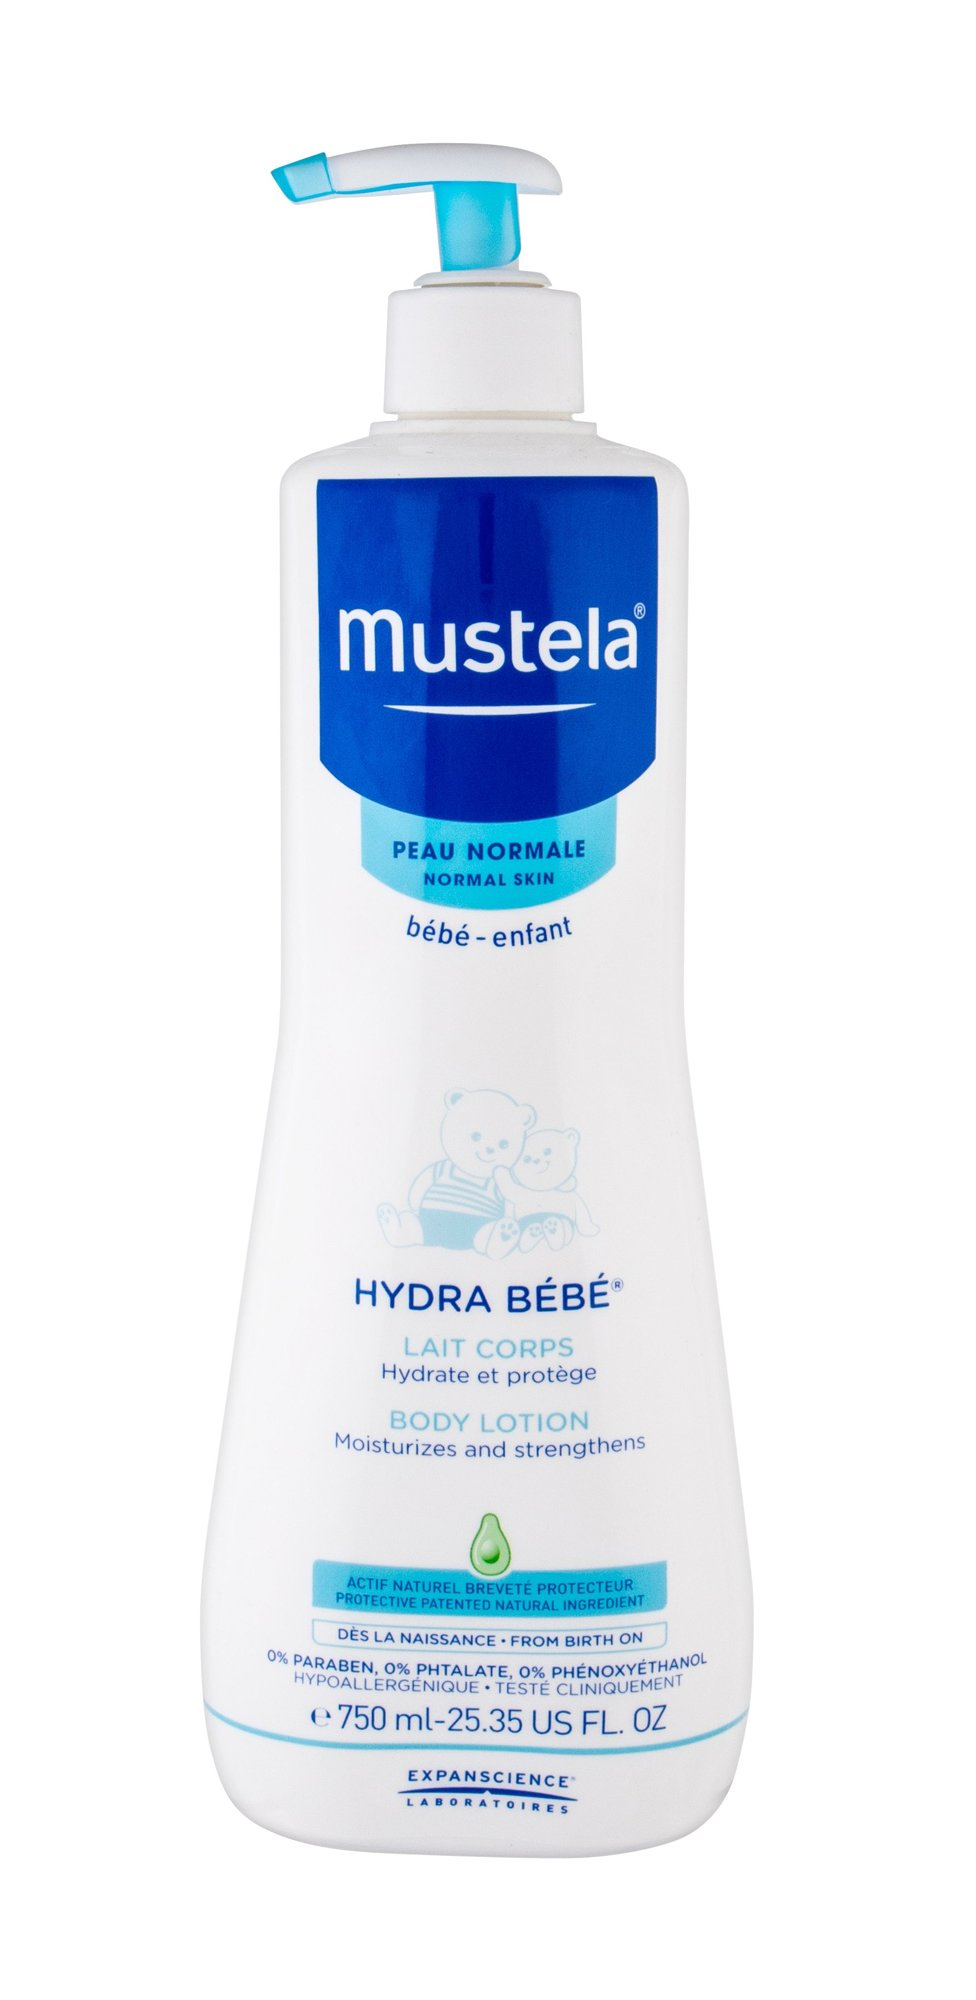 Mustela Hydra Bébé